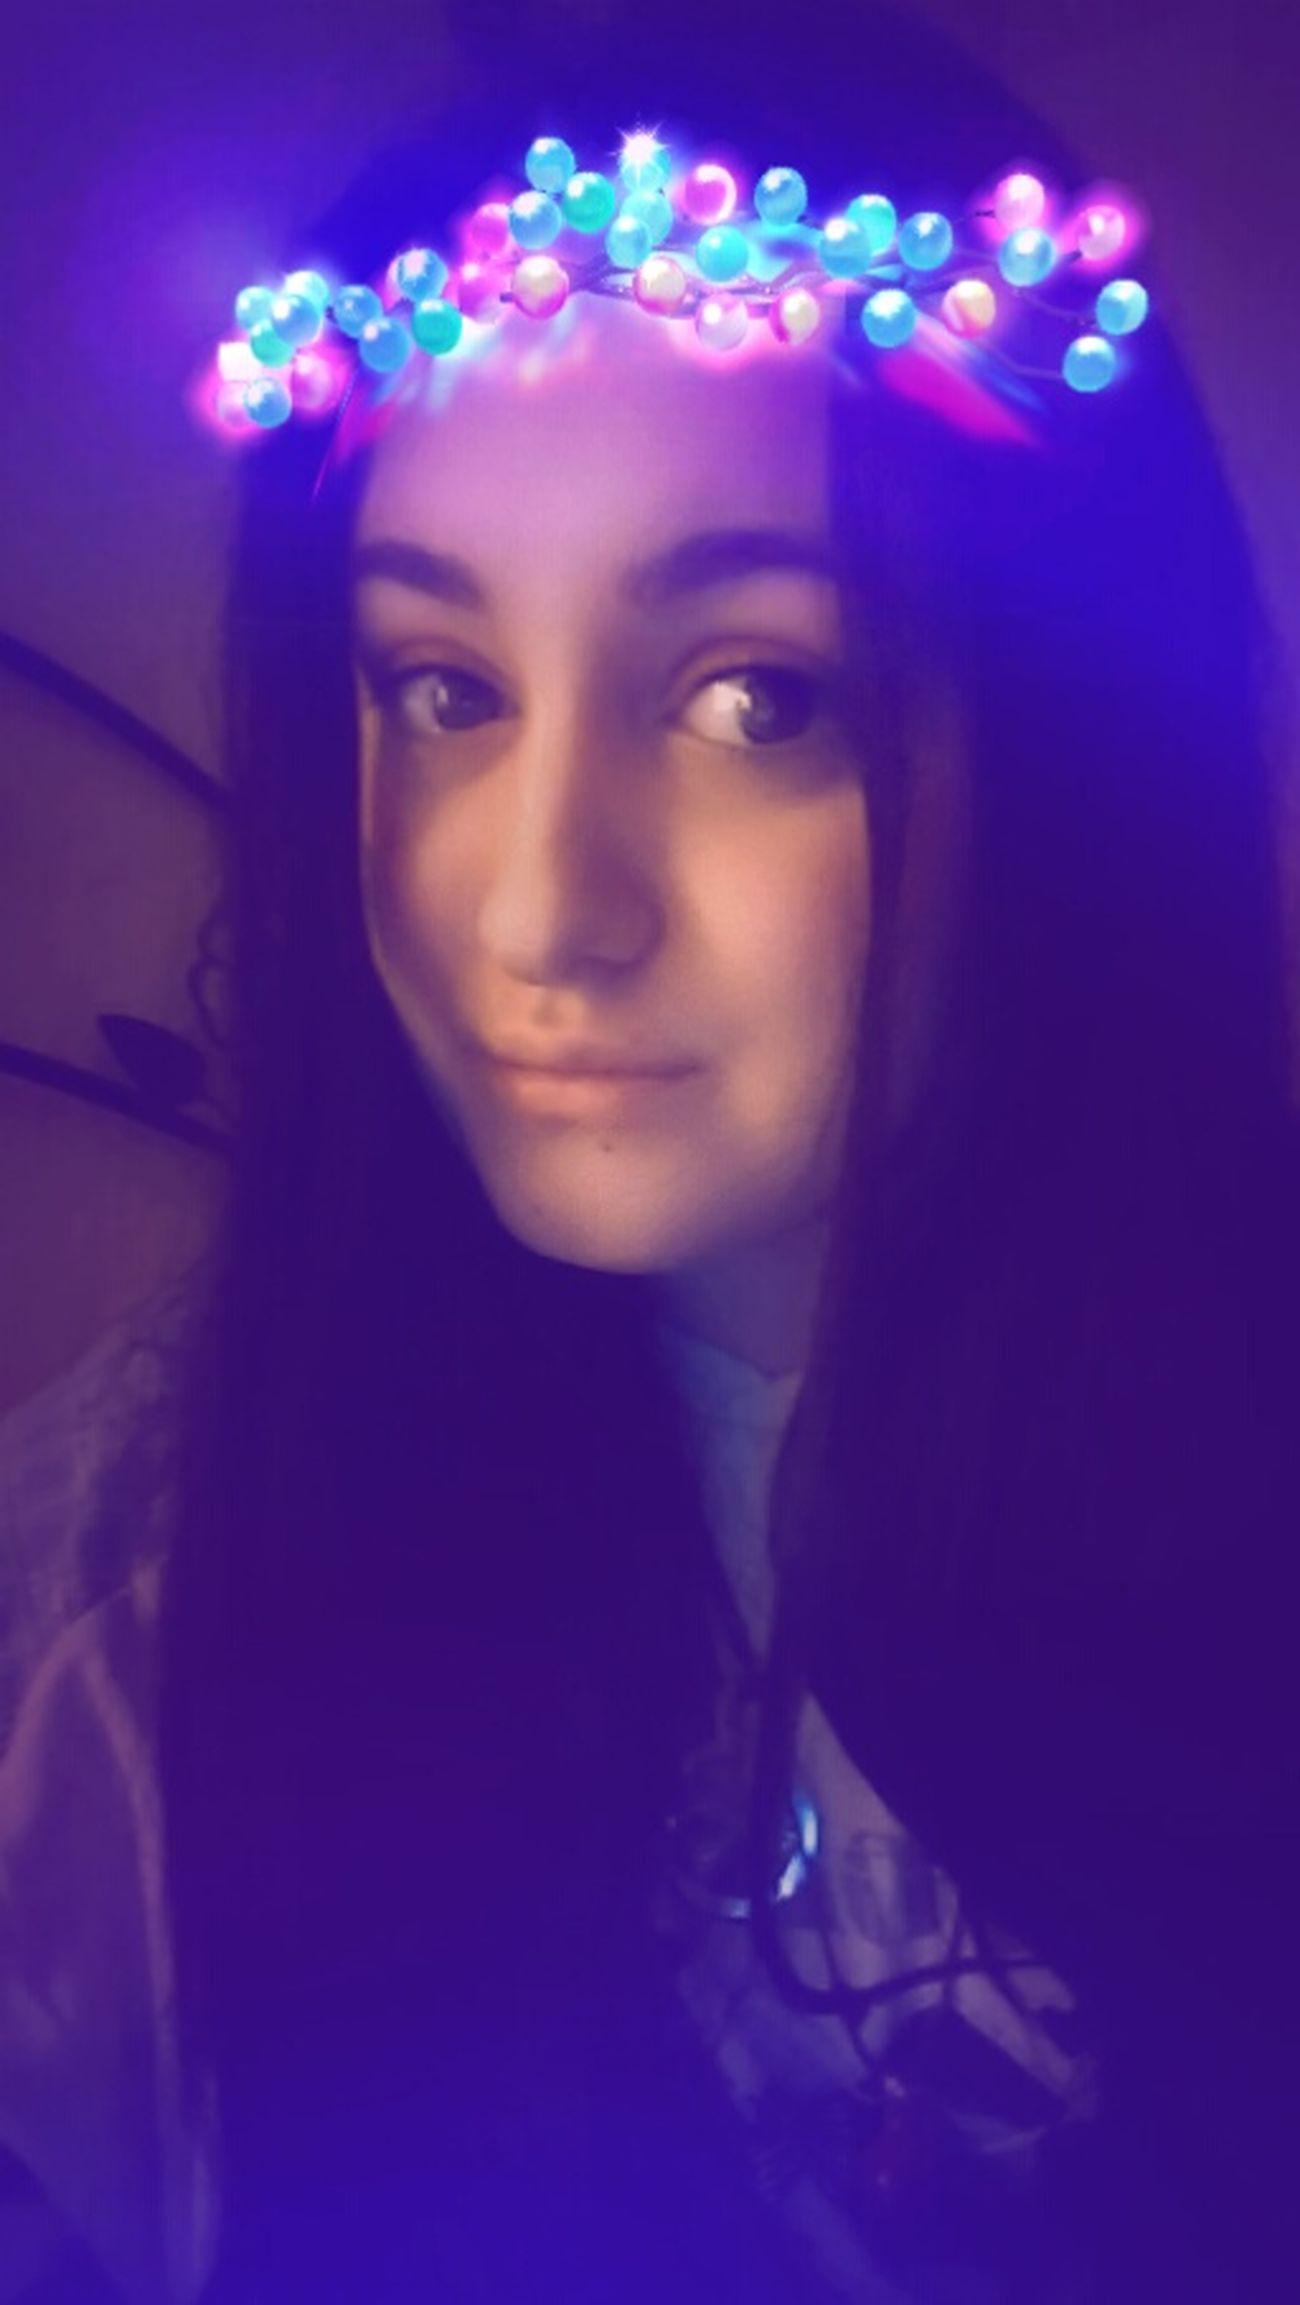 I will miss christmas :( Beautiful Woman Beautiful People Long Hair Young Adult Beauty Illuminated Young Women Women Feellikeaprincess Snapchat Selfies Beautiful Sexylady Sexywoman Model Beautiful Girl Sexygirl Modelgirl SexyGirl.♥ One Girl Only No Make-up No Makeup Nomakeup Feellikeamodel Feellikeaqueen Feellikeadiva